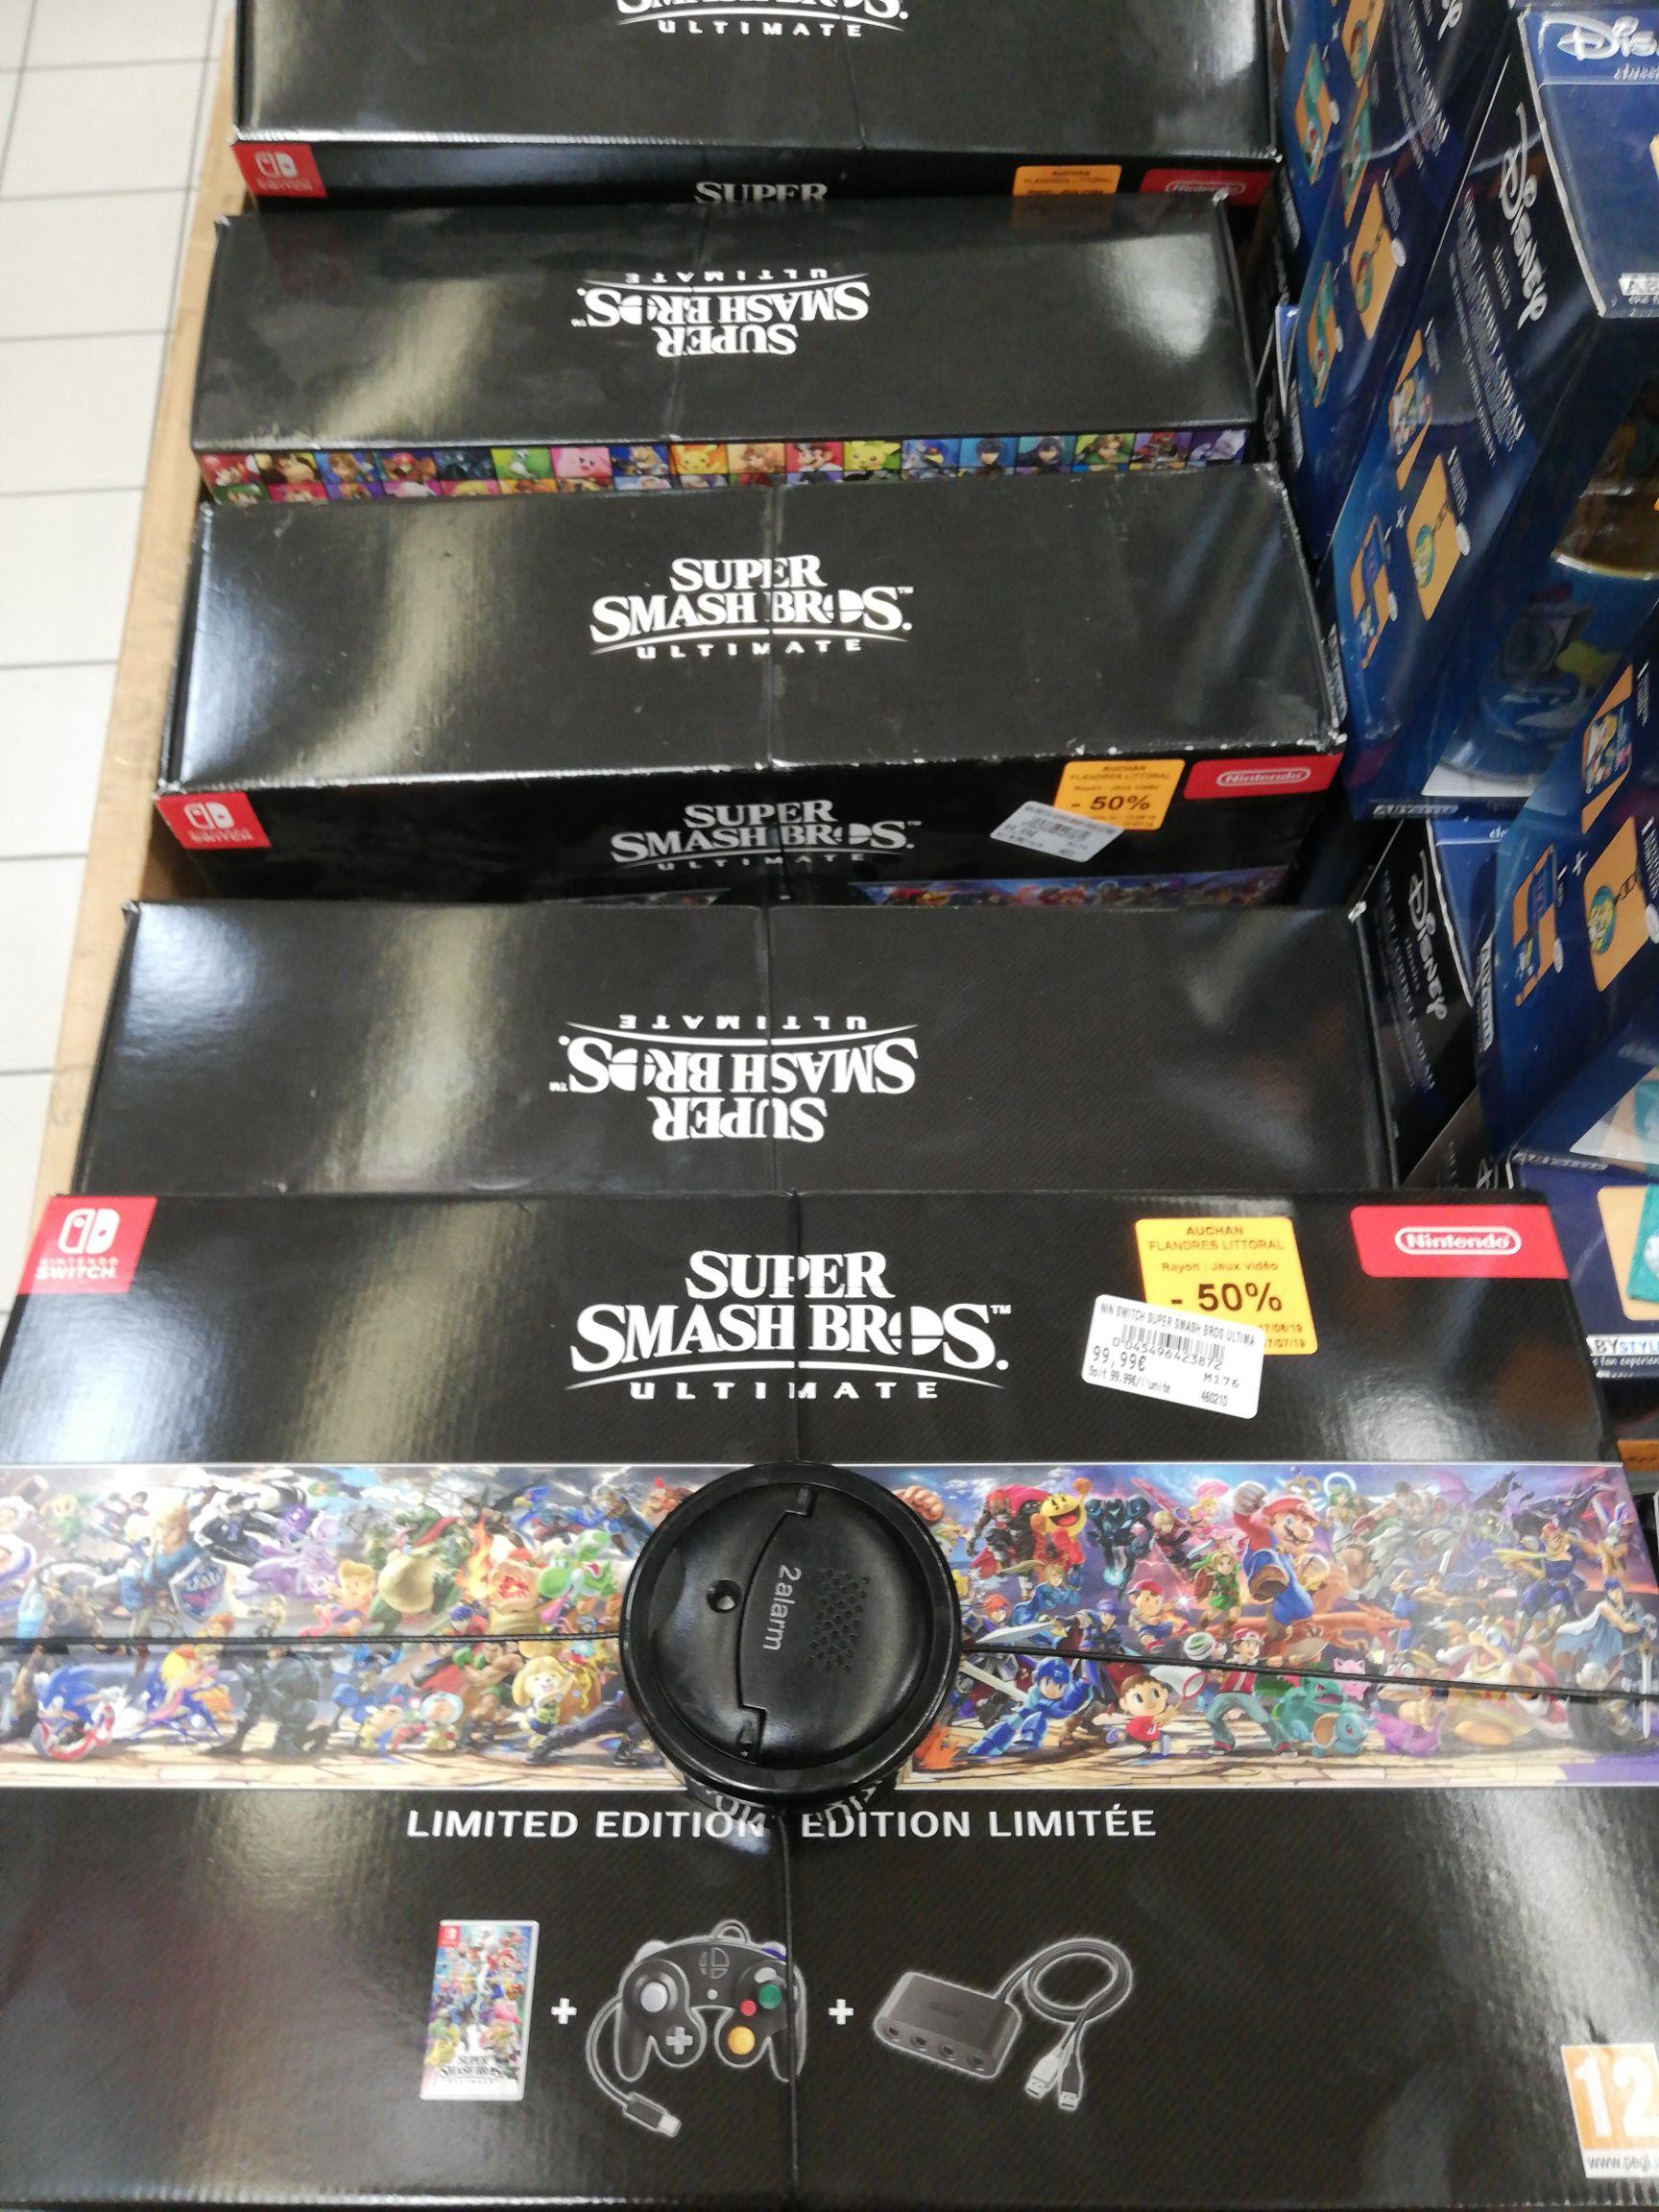 Pack Super Smash Bros. Ultimate sur Nintendo Switch (jeu, manette, adaptateur) (Grande-Synthe 59)